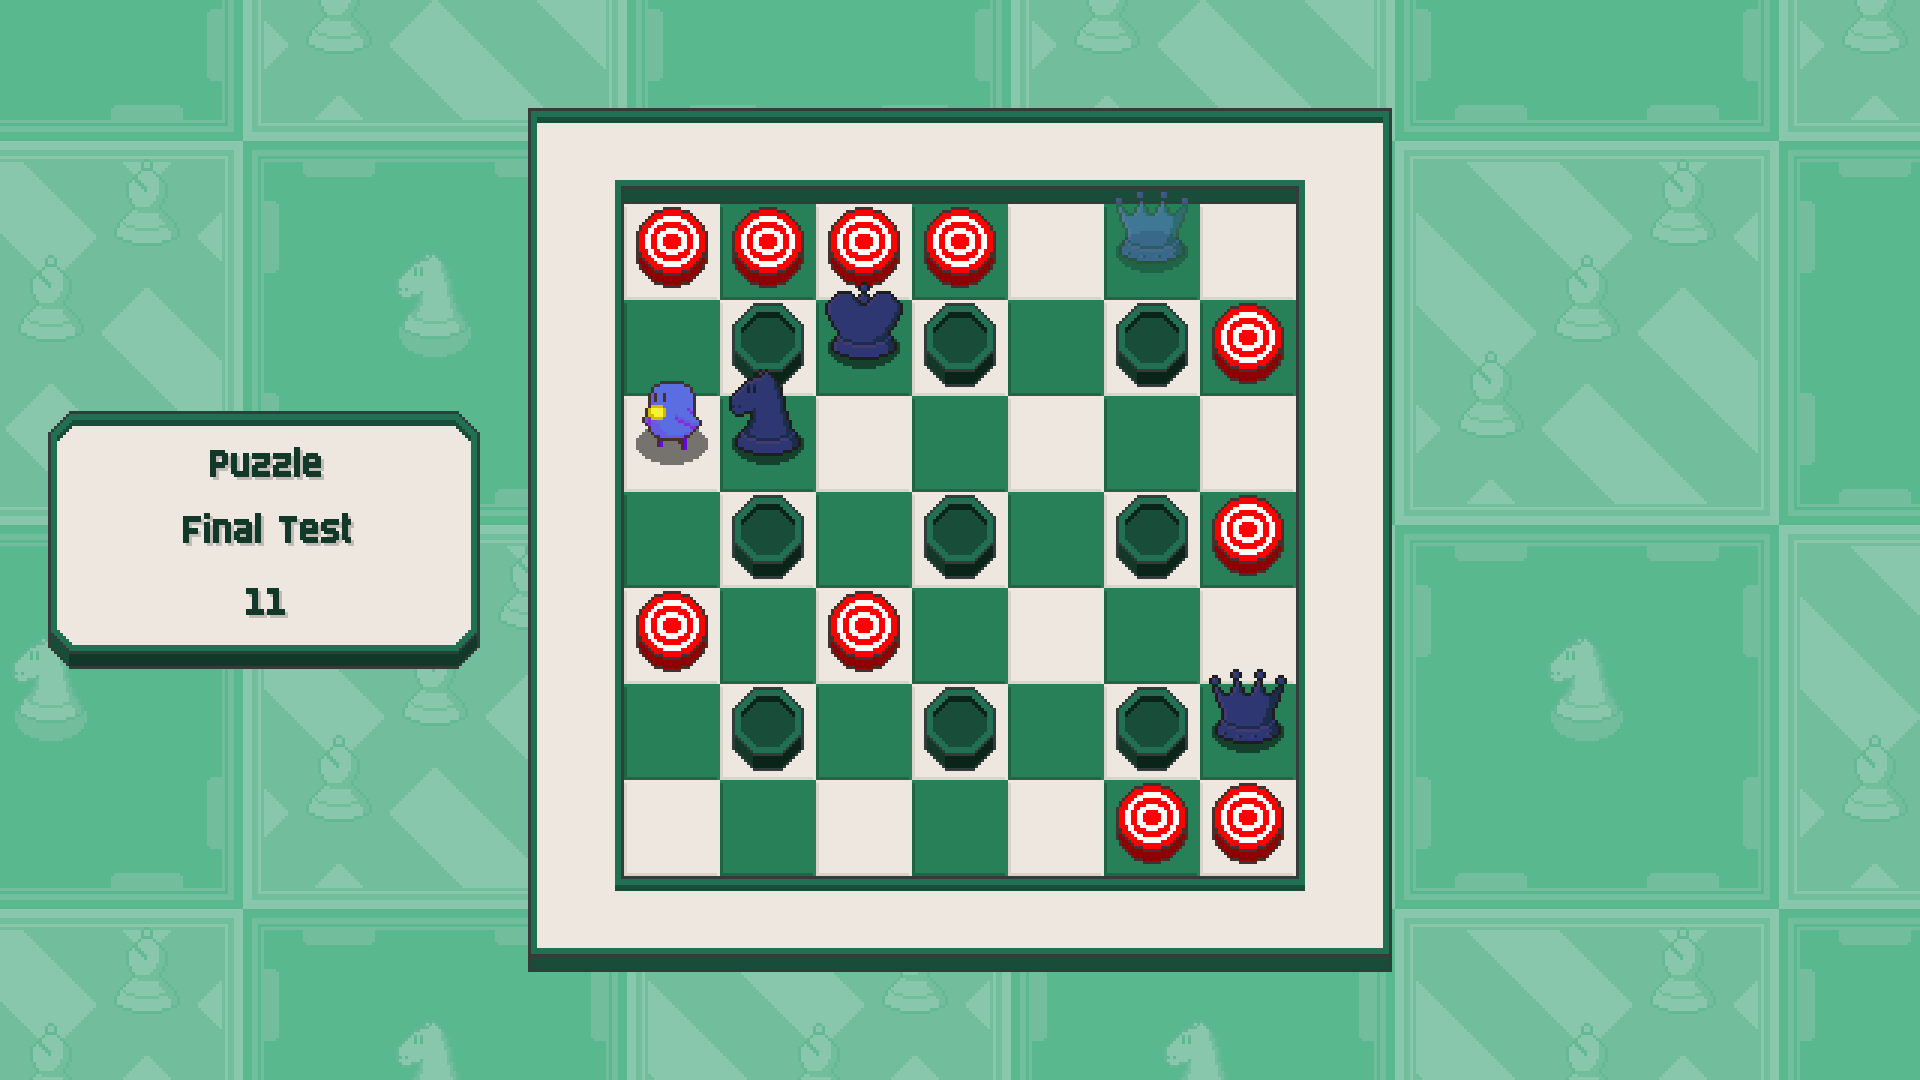 Chessplosion - Puzzle Solution Guide + Achievements Walkthrough - Grandblaster: Final Test - DC4788D